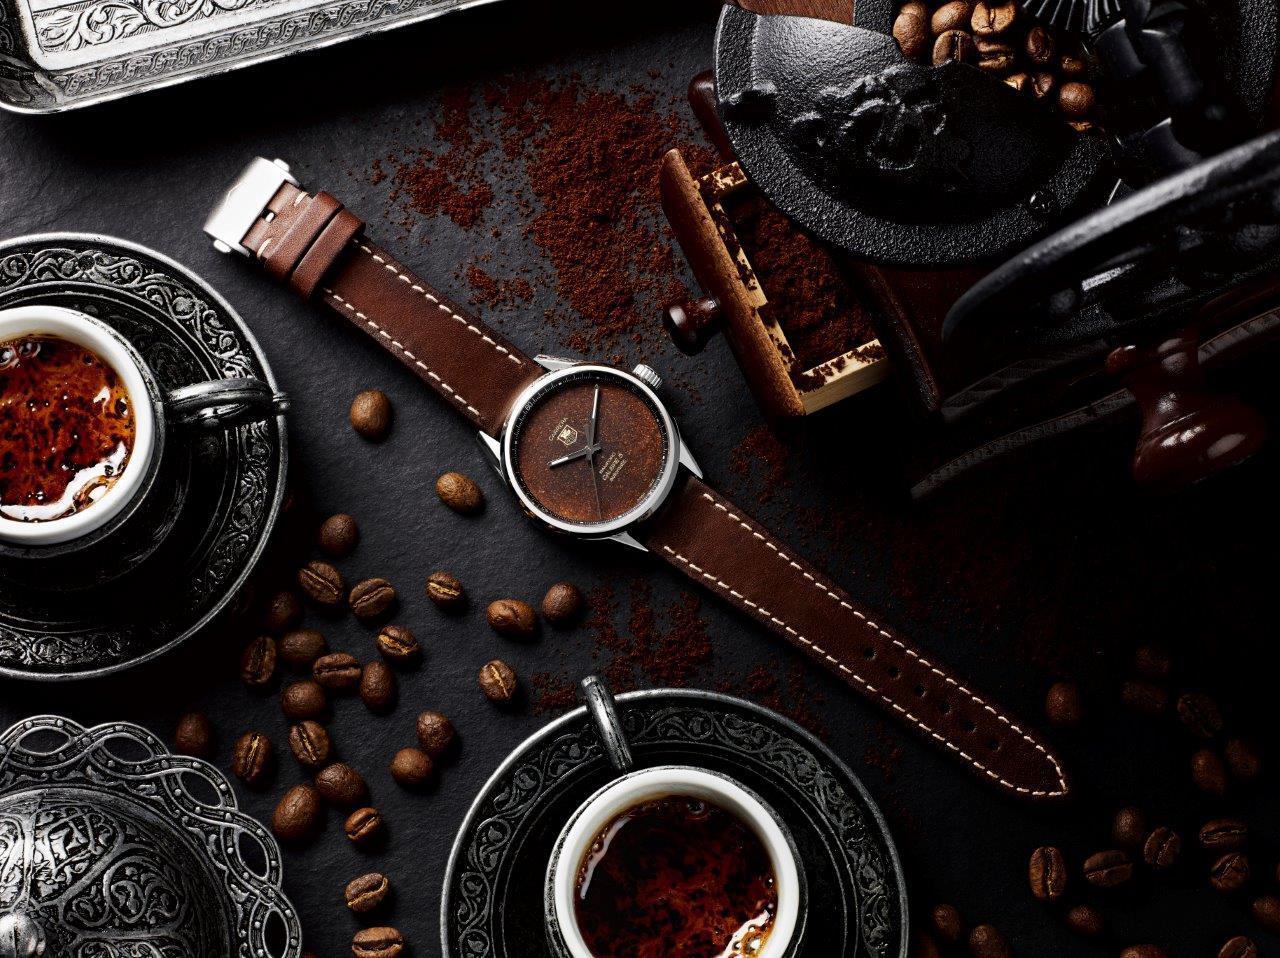 BWDxBadgerworks_TAG Heuer Carrera Calibre 5_Coffee_Steel_Lifestyle